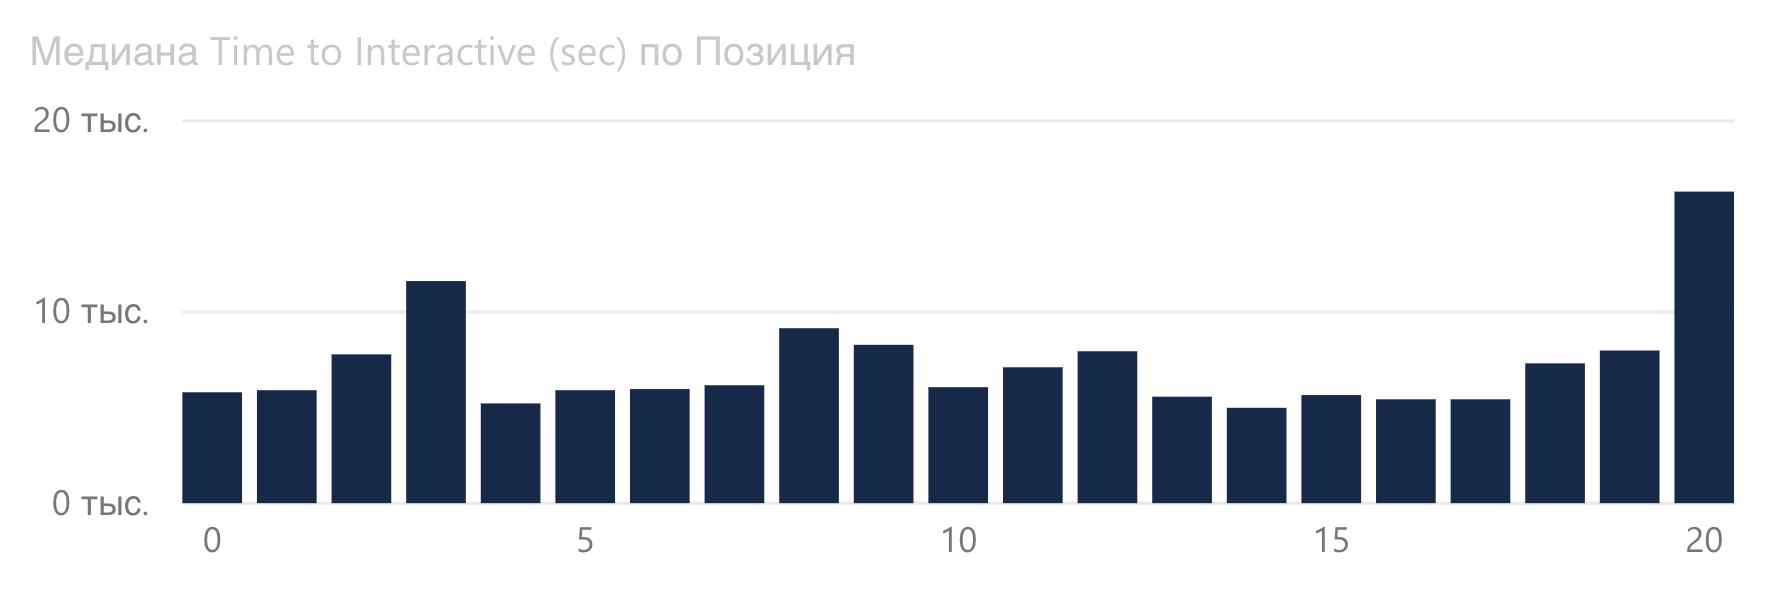 График зависимости Time to Interactive от позиции Google в туристической сфере.